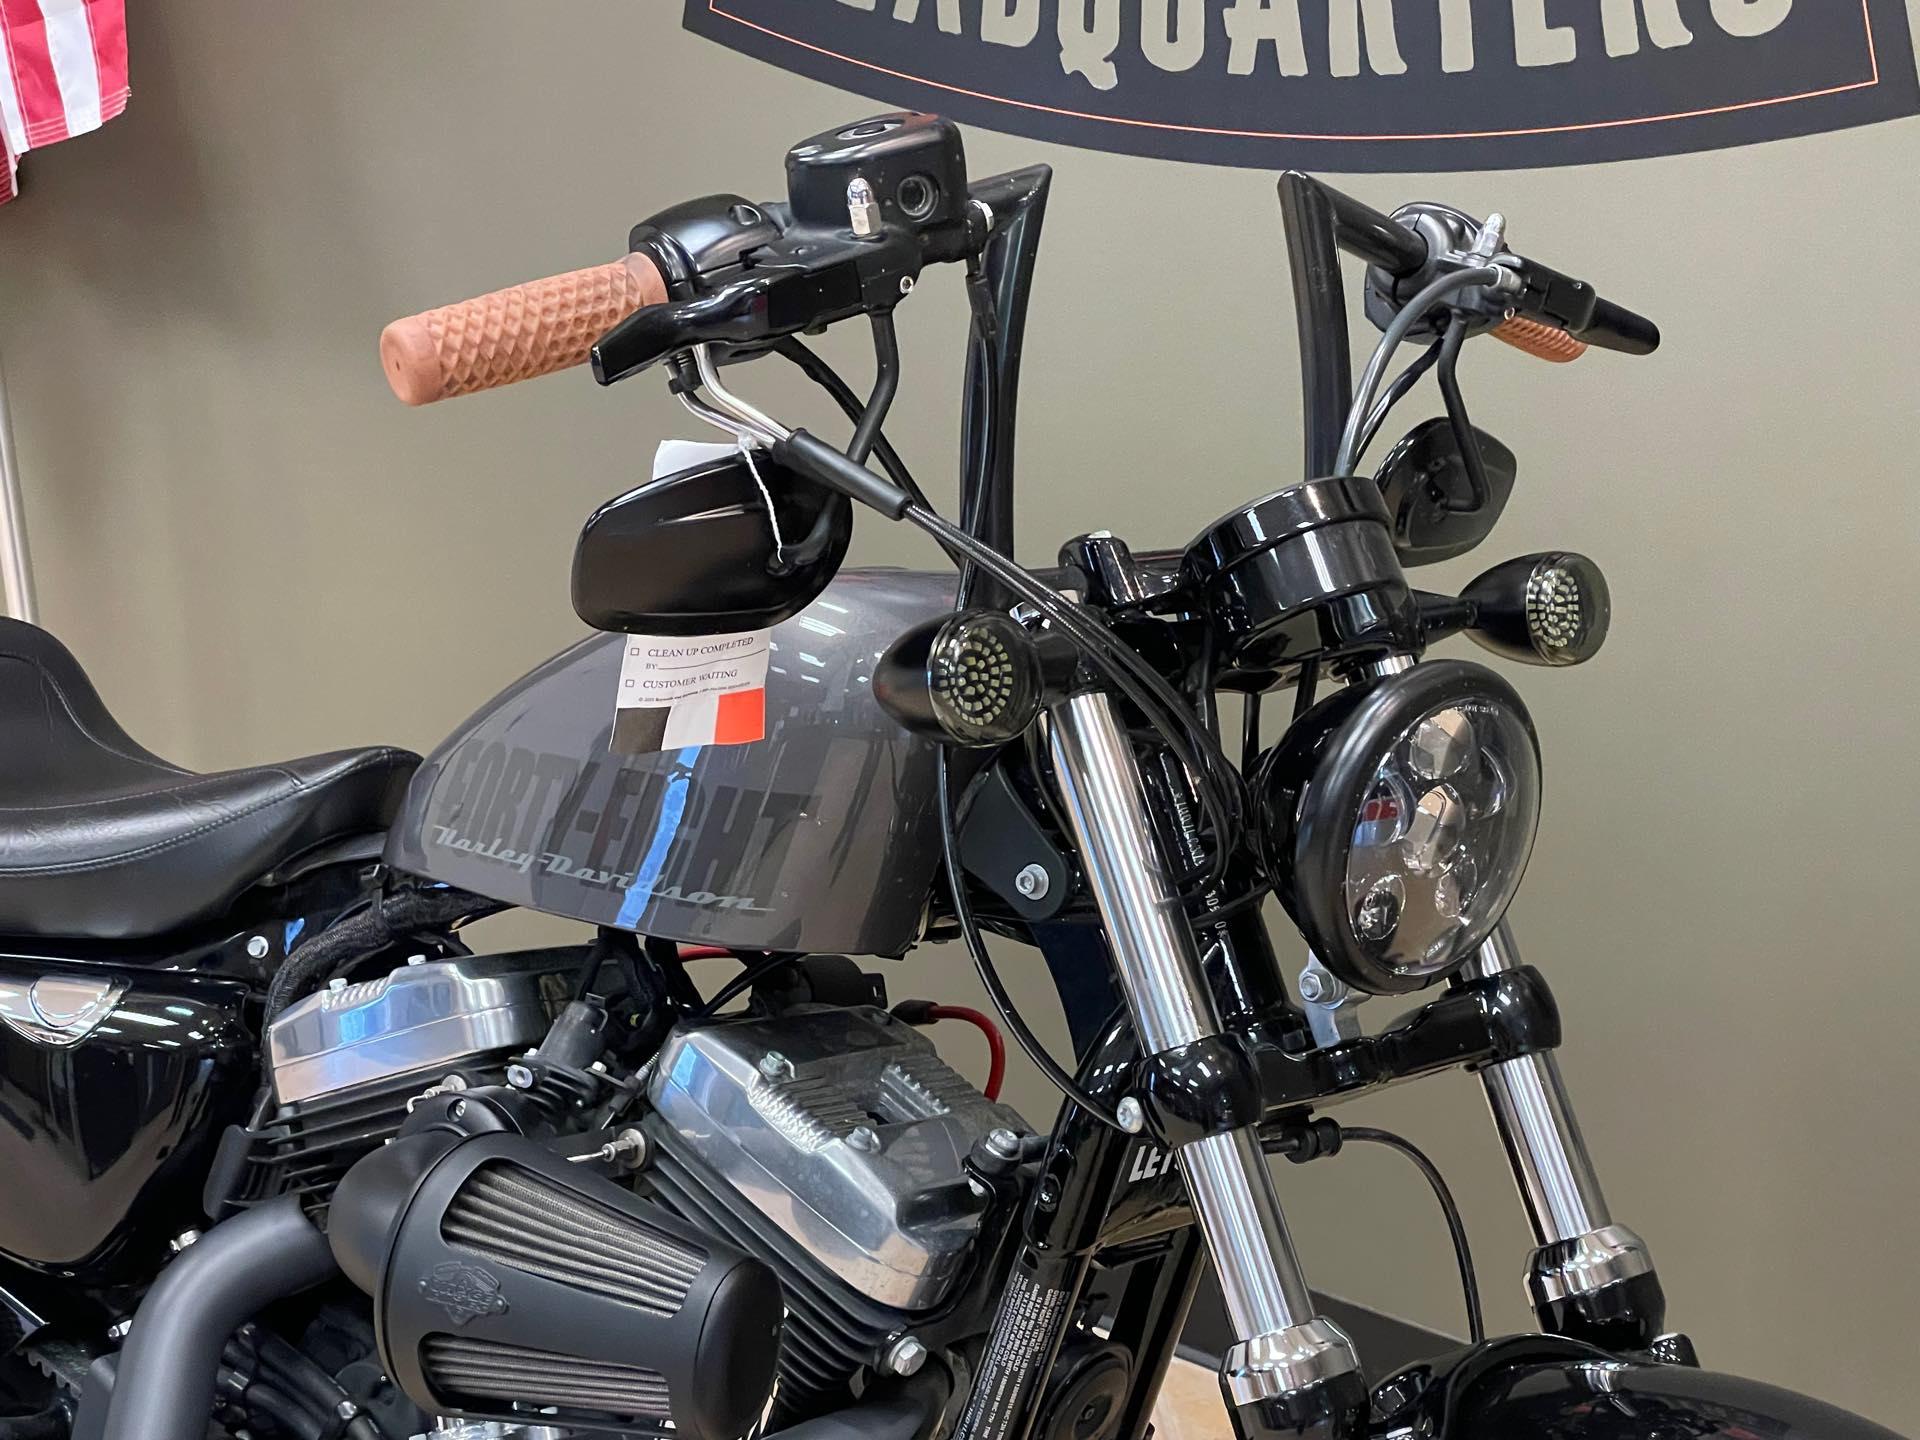 2015 Harley-Davidson Sportster Forty-Eight at Loess Hills Harley-Davidson